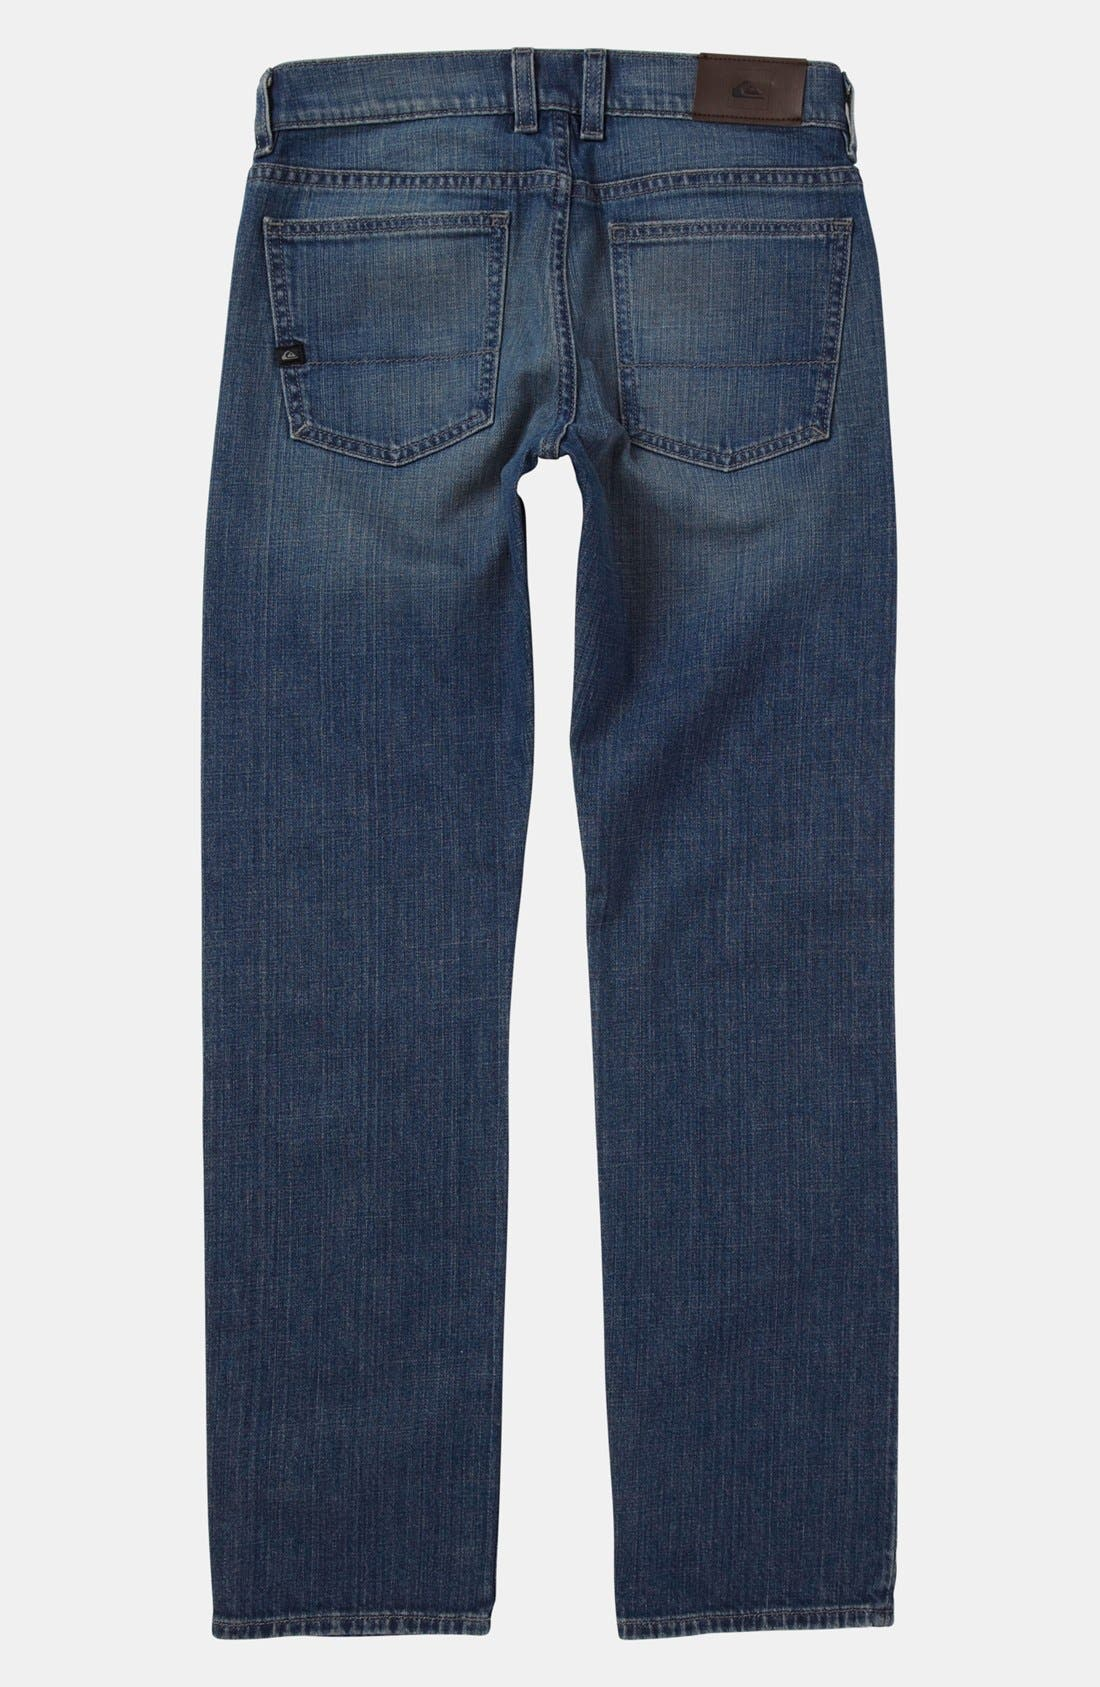 Alternate Image 1 Selected - Quiksilver 'Distortion' Straight Leg Jeans (Little Boys)